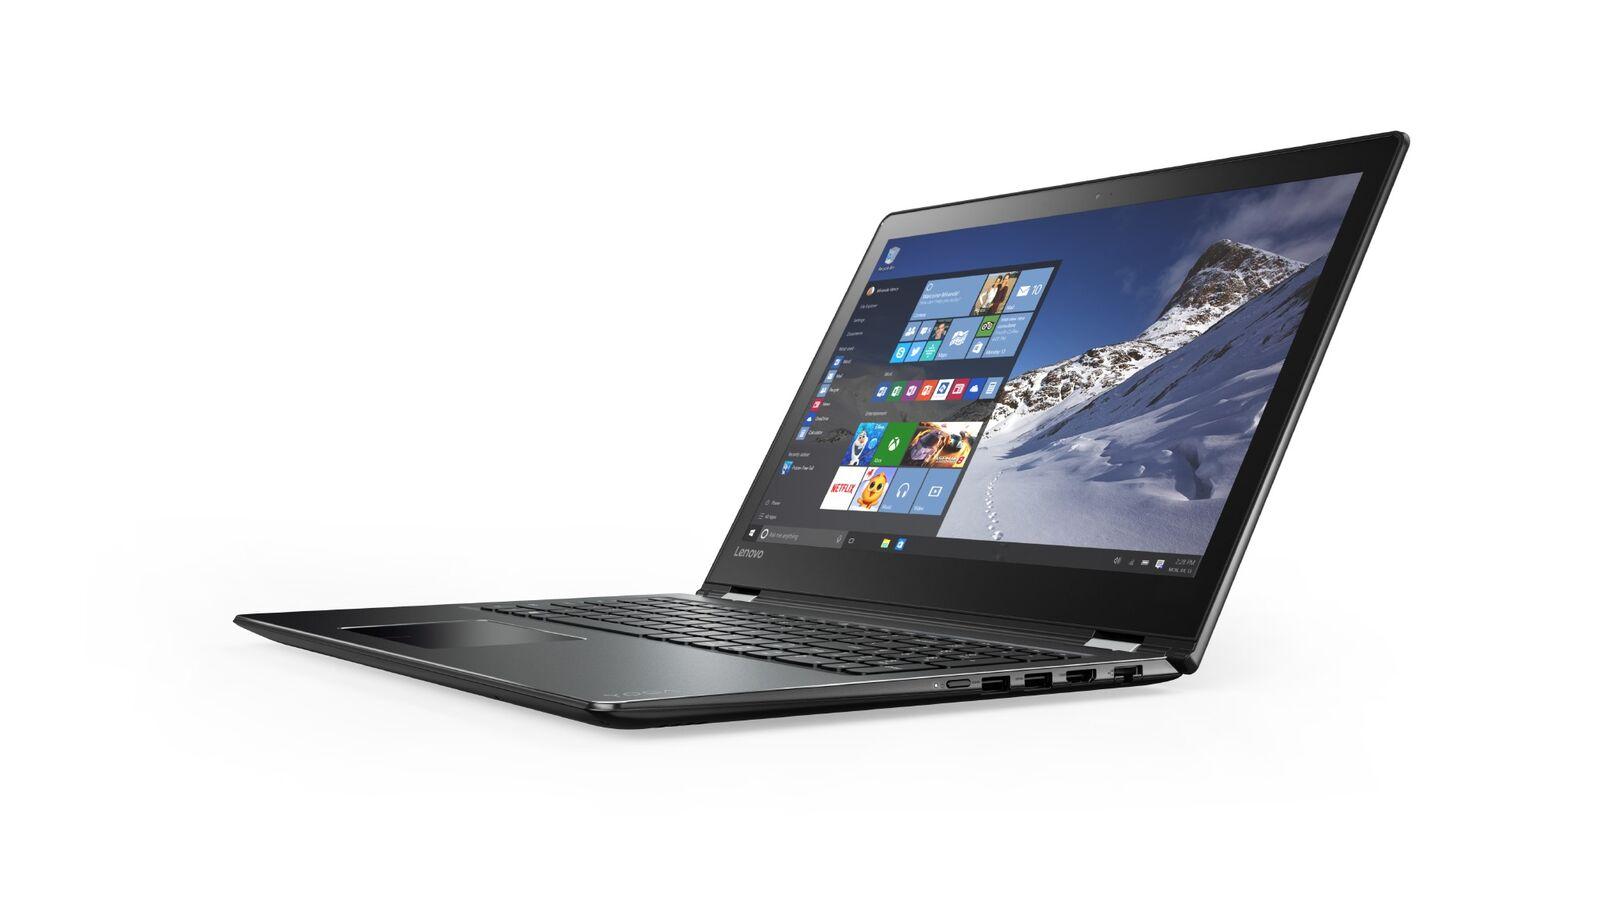 "Lenovo YOGA 510-15IKB i5-7200U 3,10GHz/8GB/1TB/15,6"" FHD/IPS/AG/multitouch/Radeon 2GB/WIN10 černá 80VC0005CK"